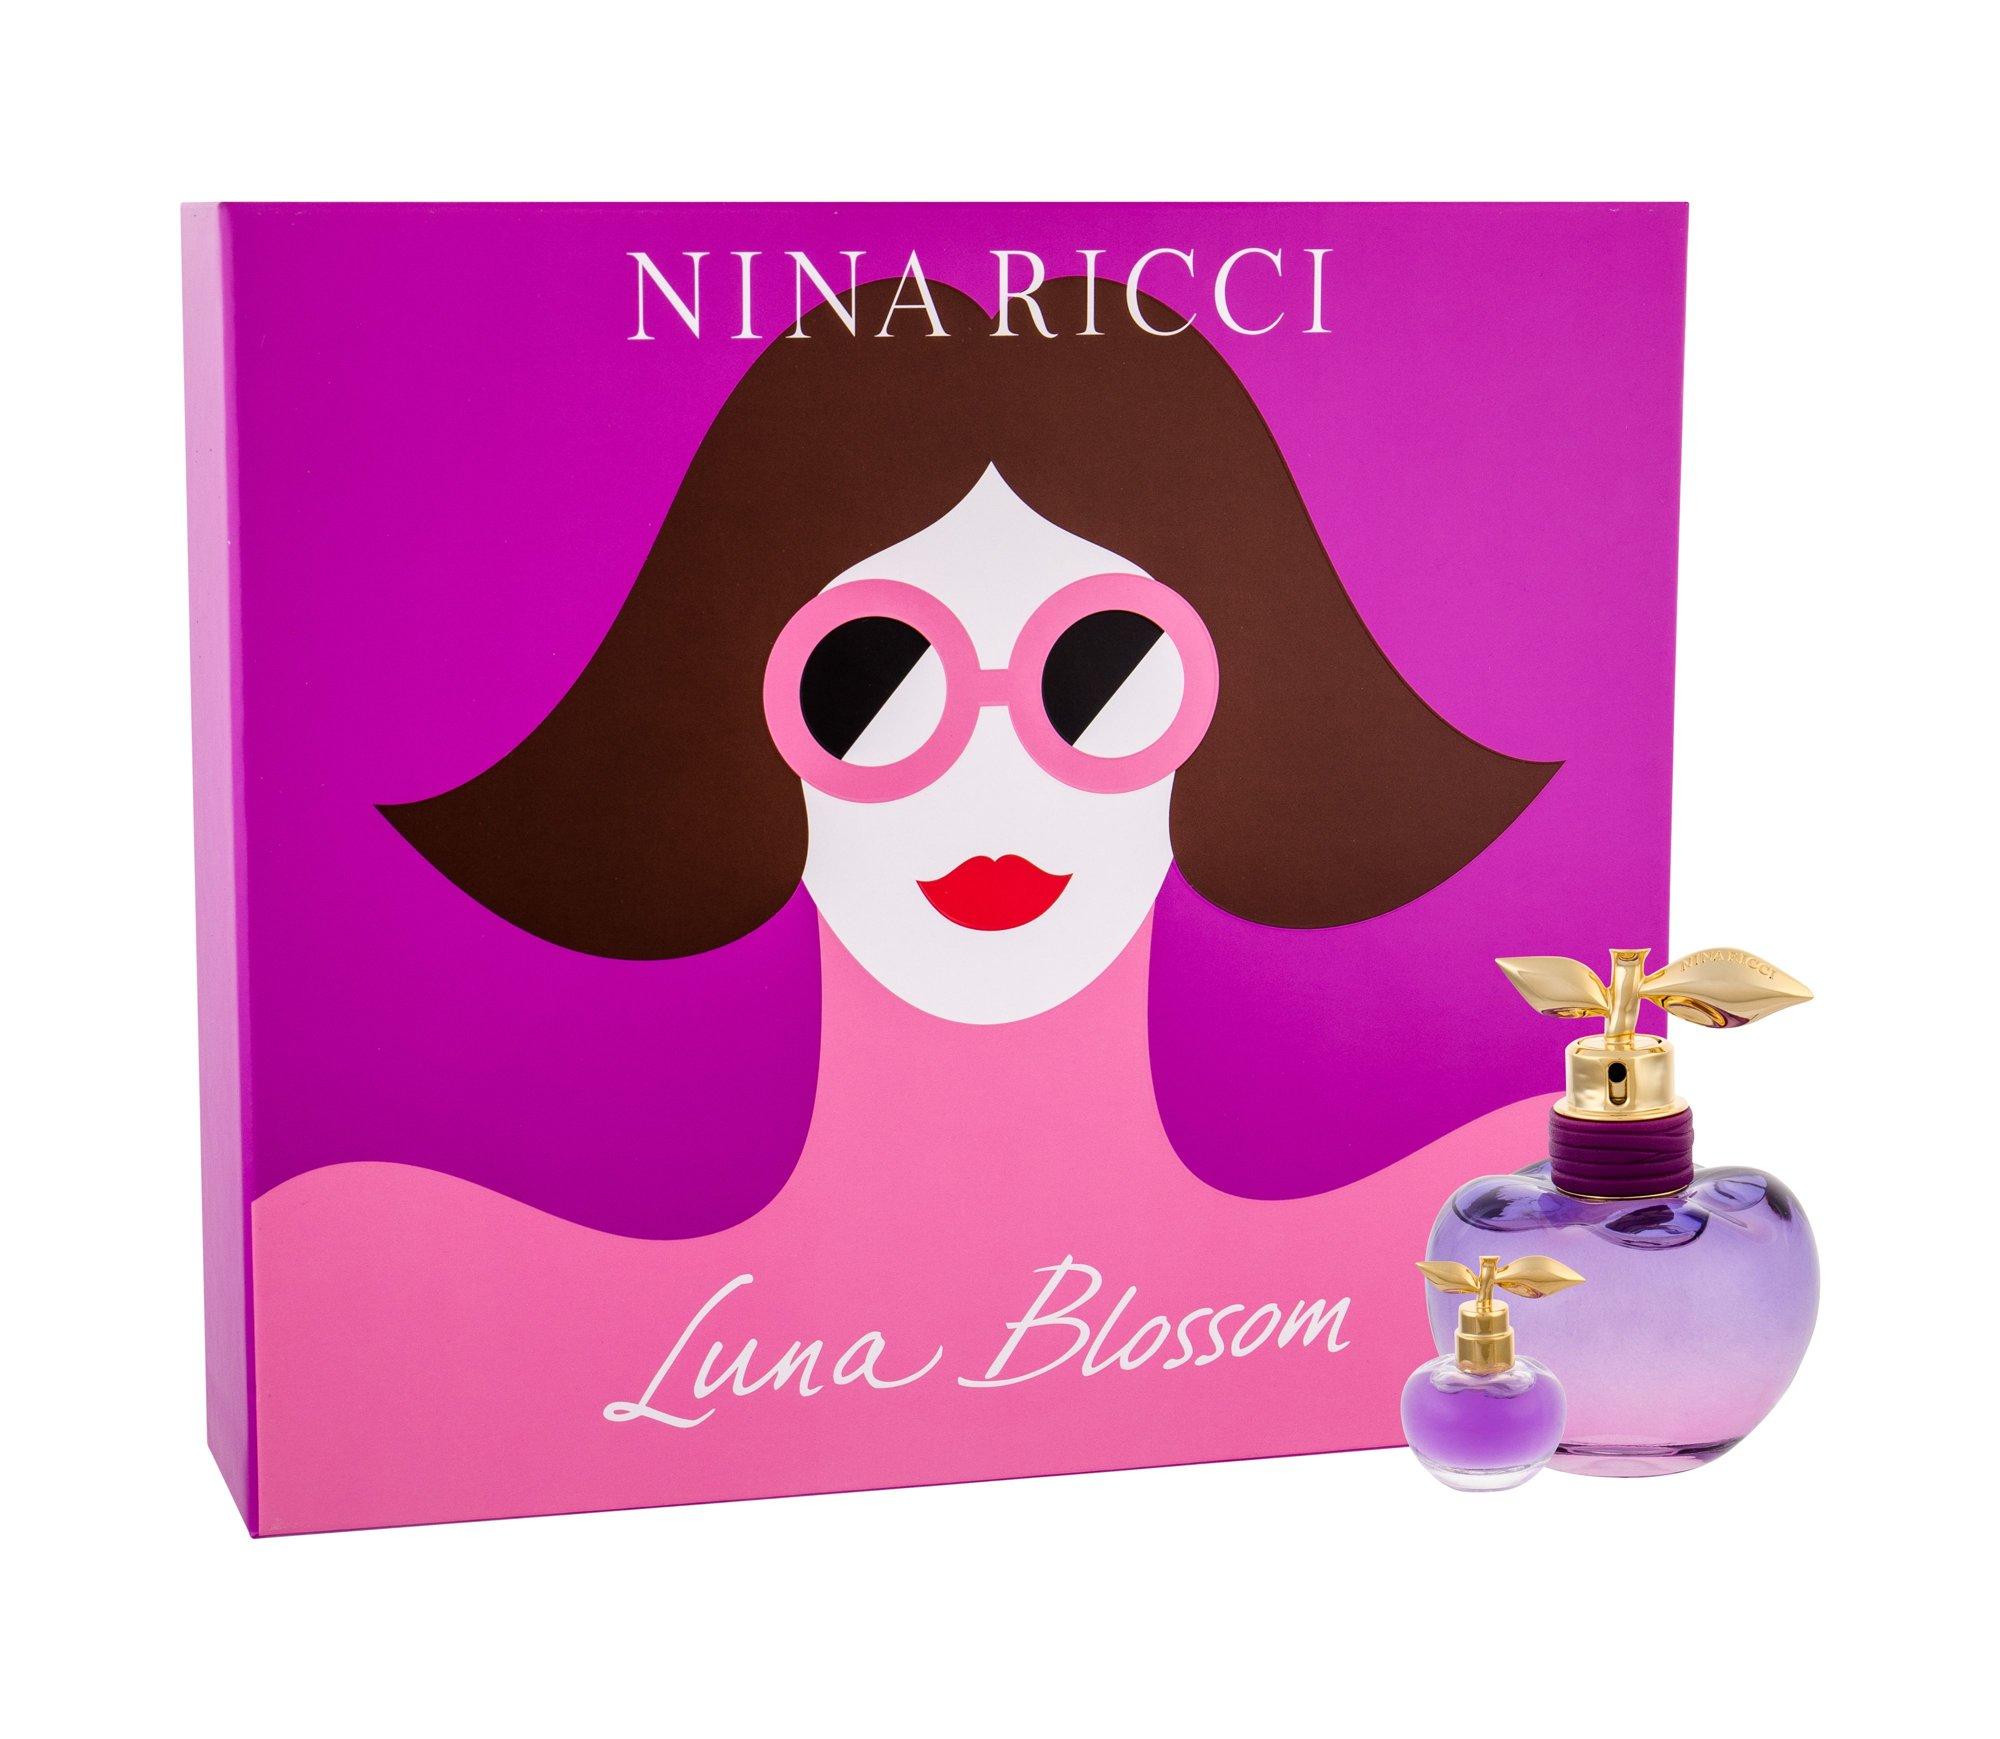 Nina Ricci Luna Blossom Eau de Toilette 80ml